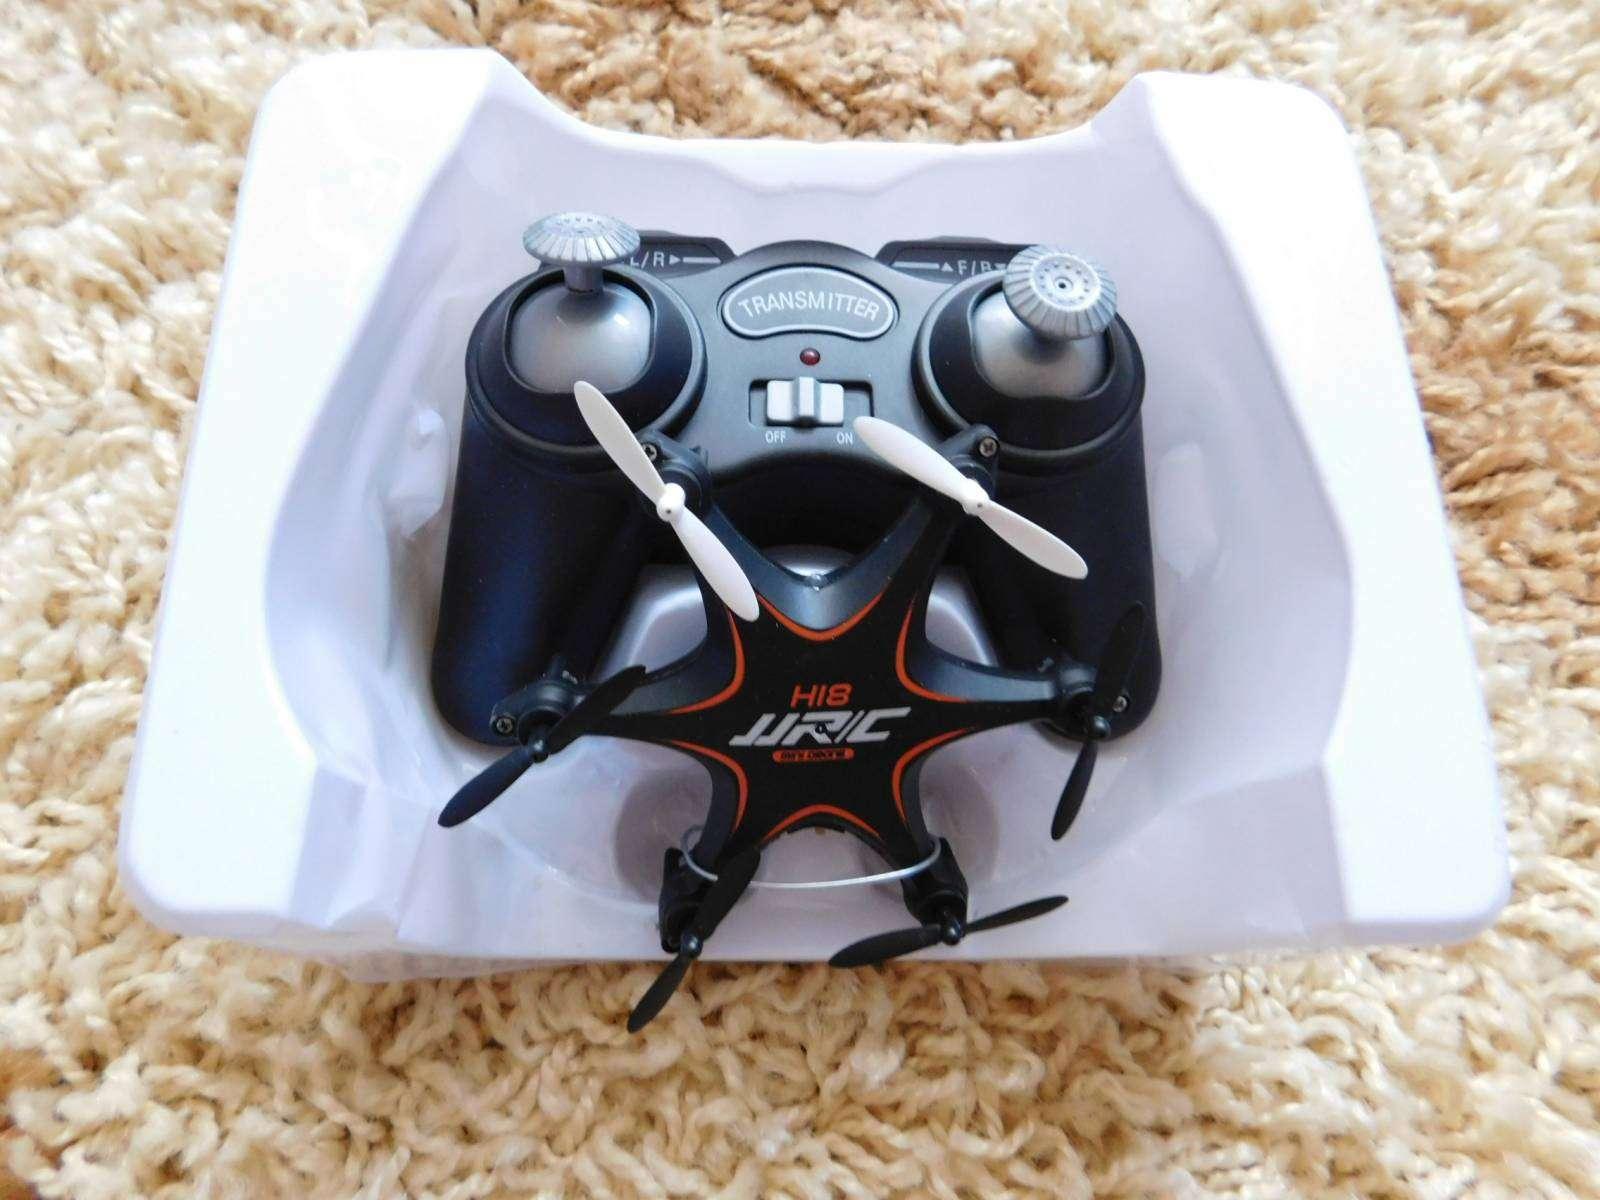 GearBest: JJRC H18 не плохой Hexacopter